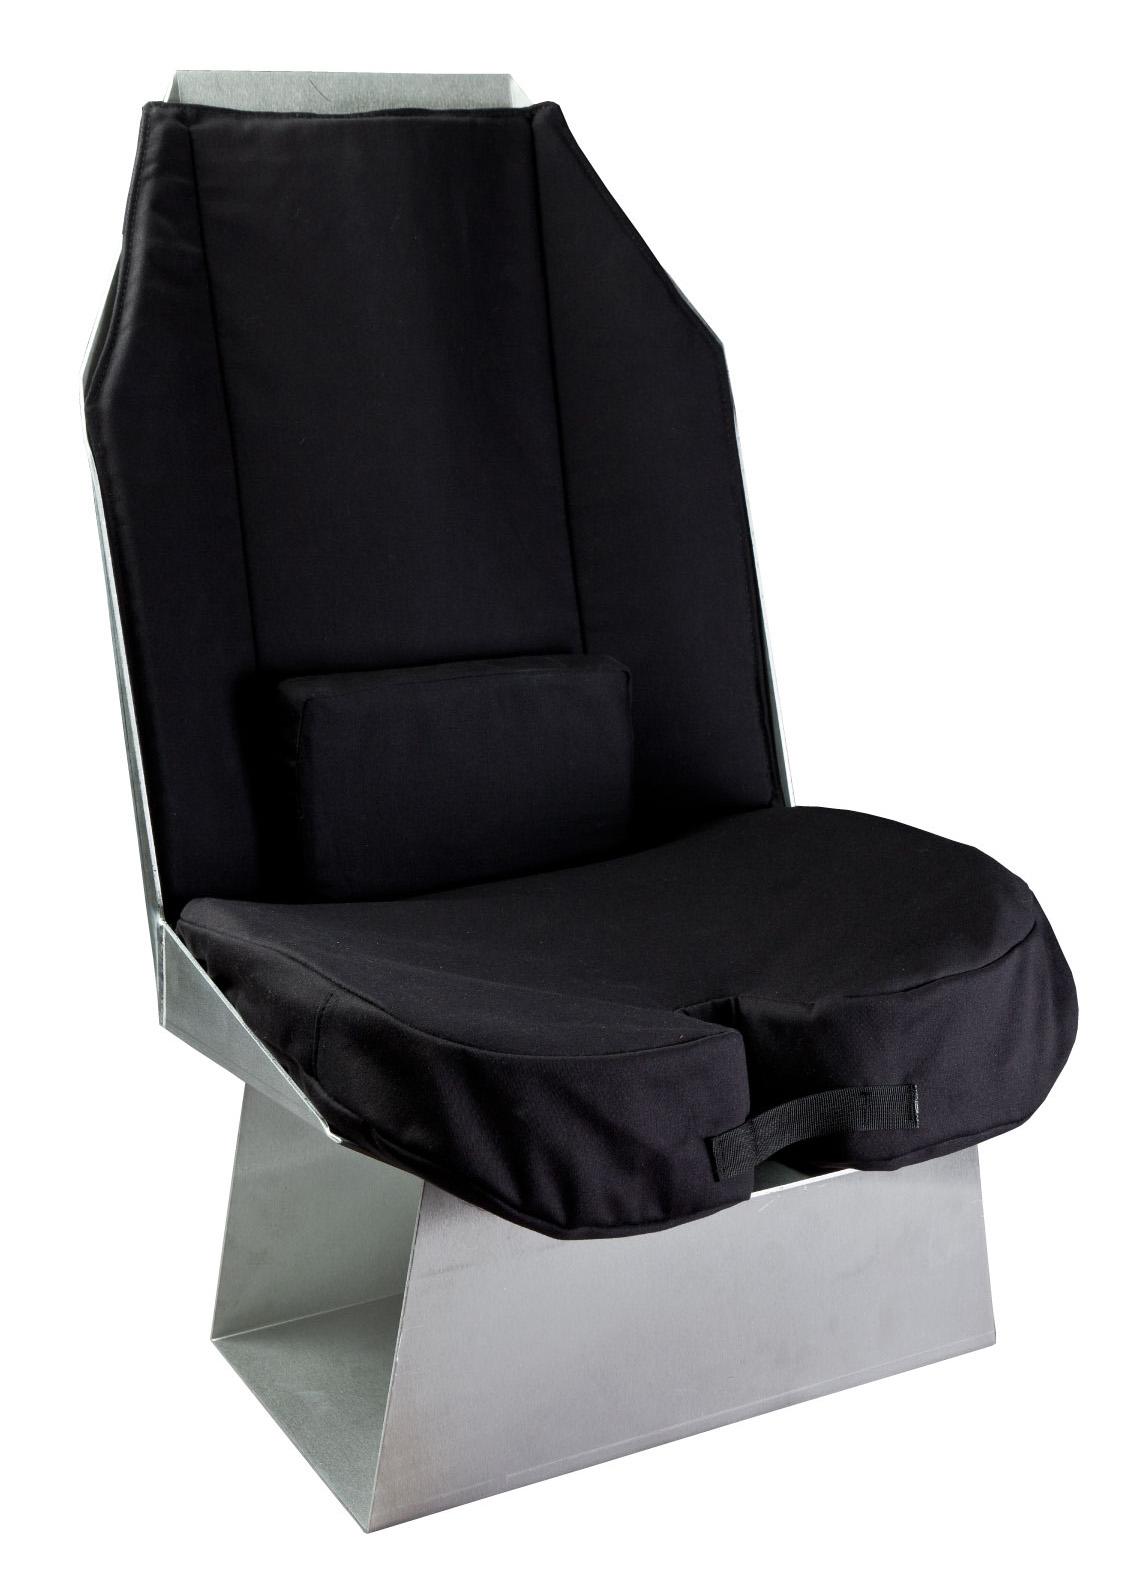 93100bd23d6 Universal Seat Cushions Skydex. H 60 Black Hawk Pilot ...